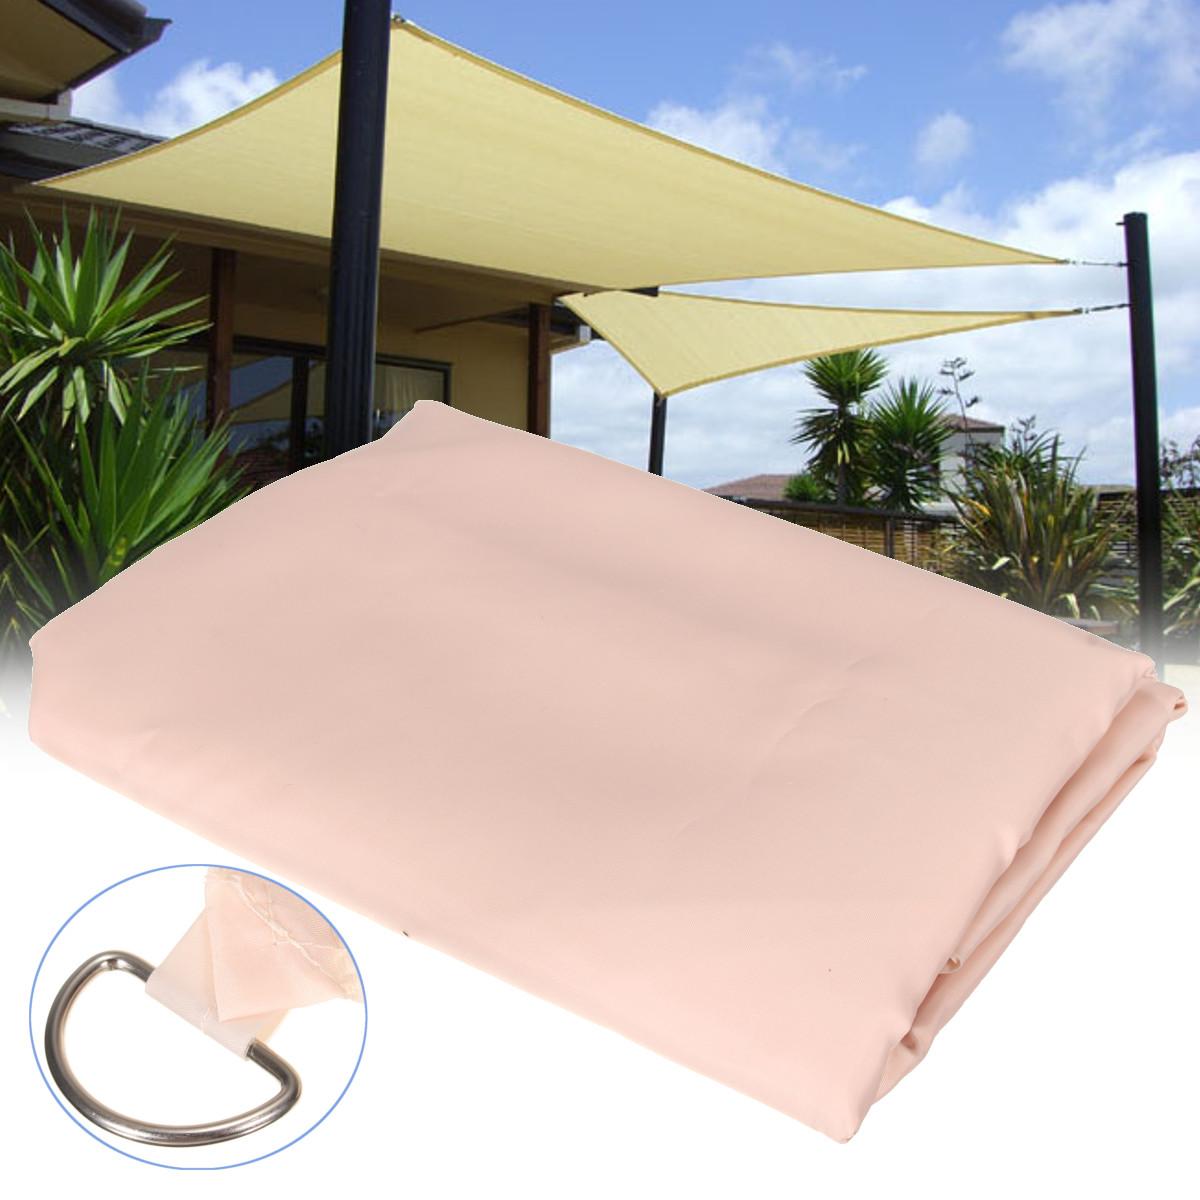 2.3X2.3M Patio Shade Sail Garden Cover Weterproof Mesh Net Window Awning Carport Canopy SKU733966